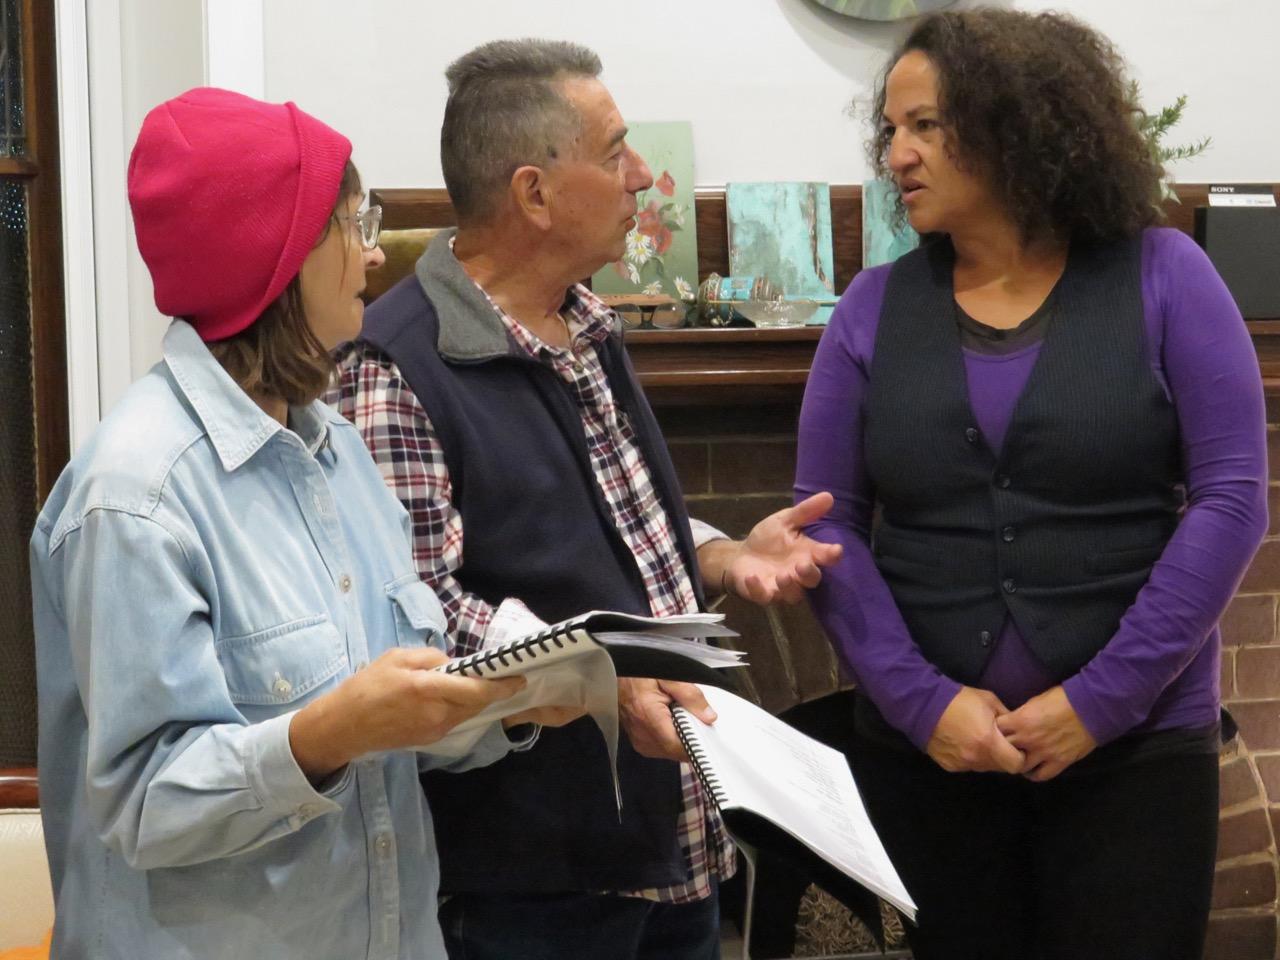 5_Tender_Community_Choir_discussing new songs with Malika Reese.jpg